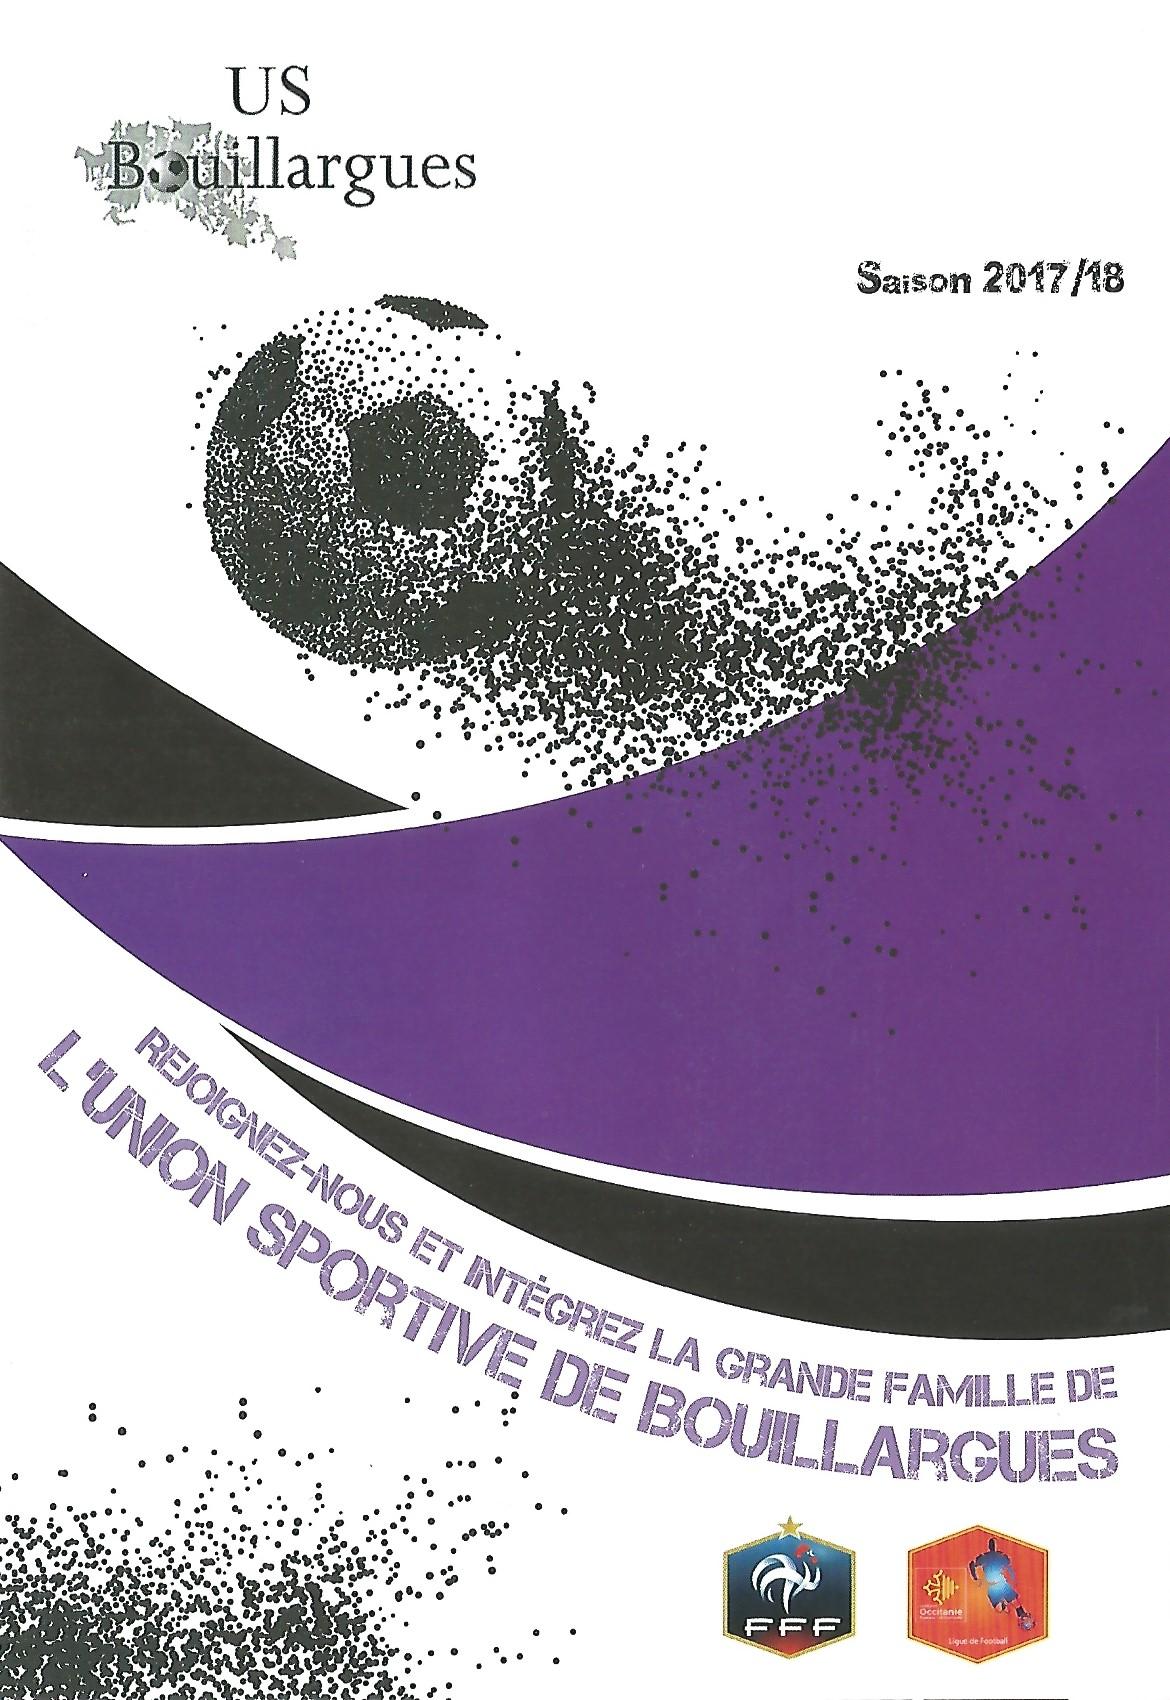 flyer1 (2).jpg